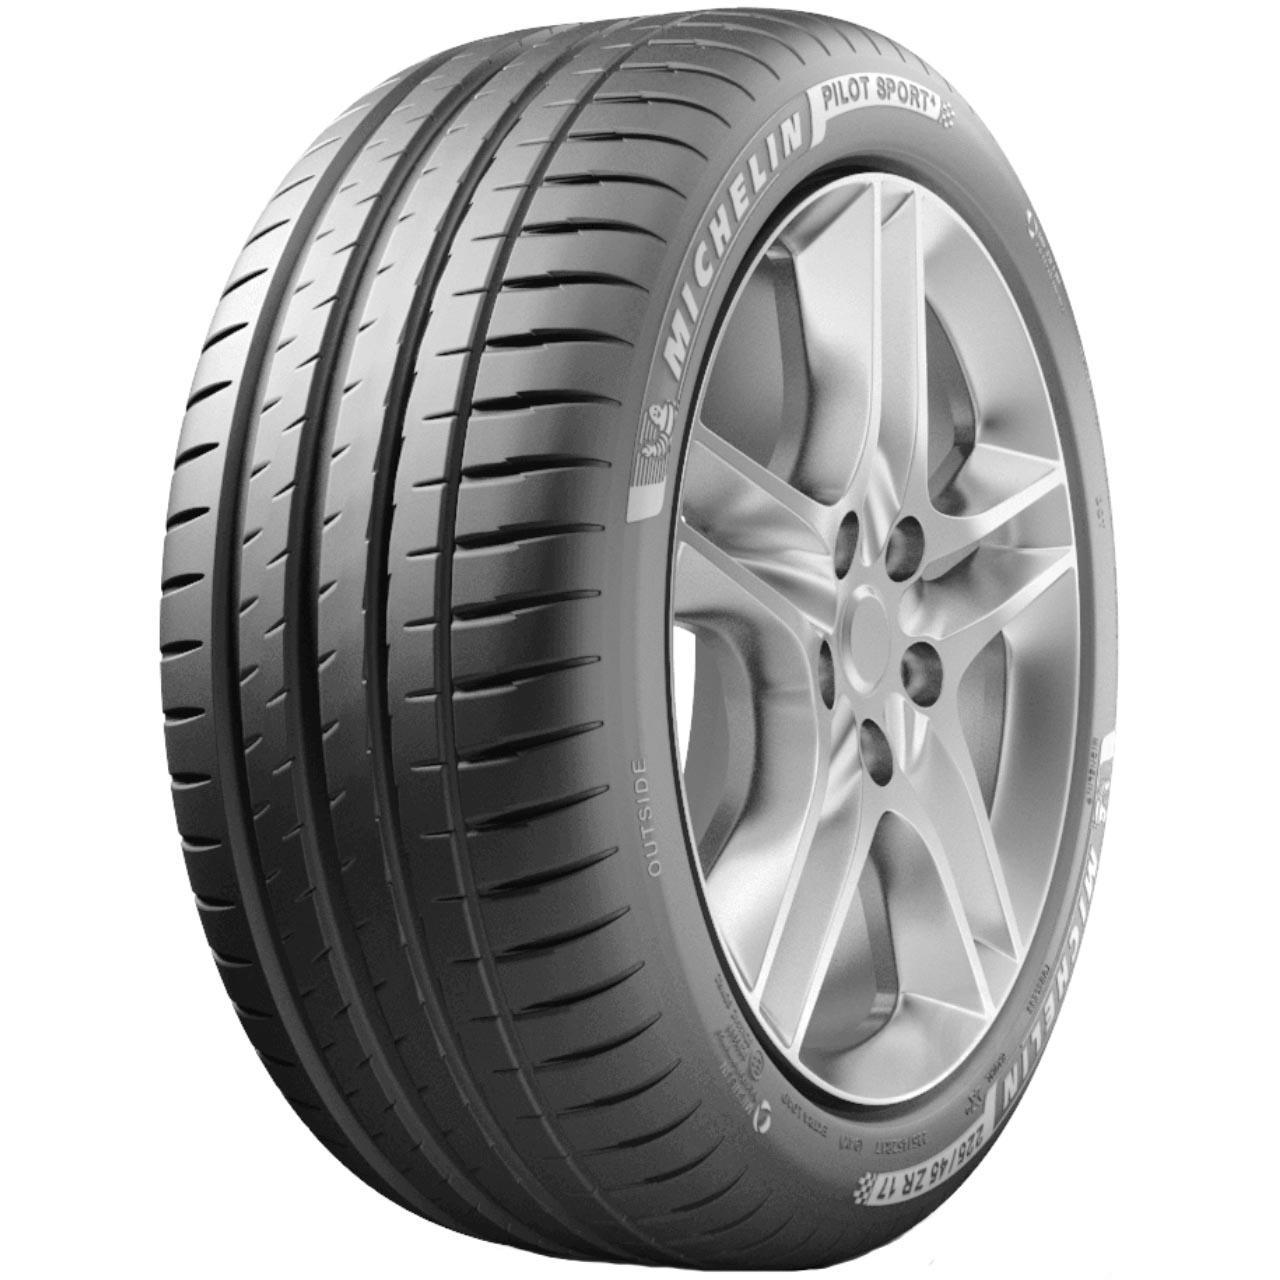 Michelin Pilot Sport 4 205/55ZR16 91W